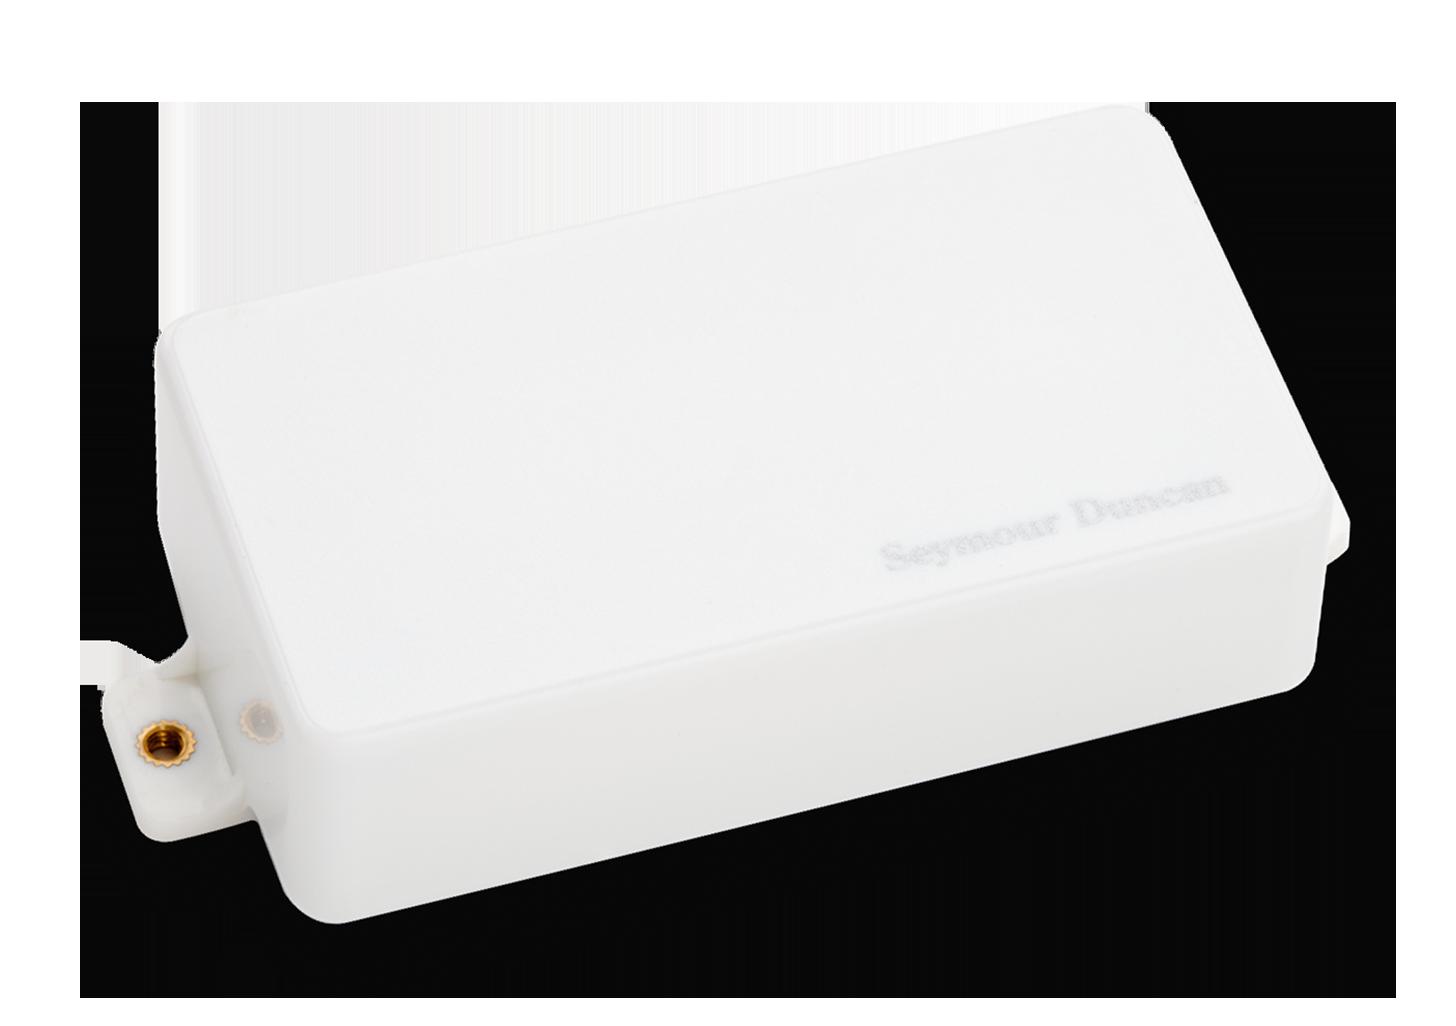 Seymour Duncan LiveWire II Classic Humbucker - Neck White